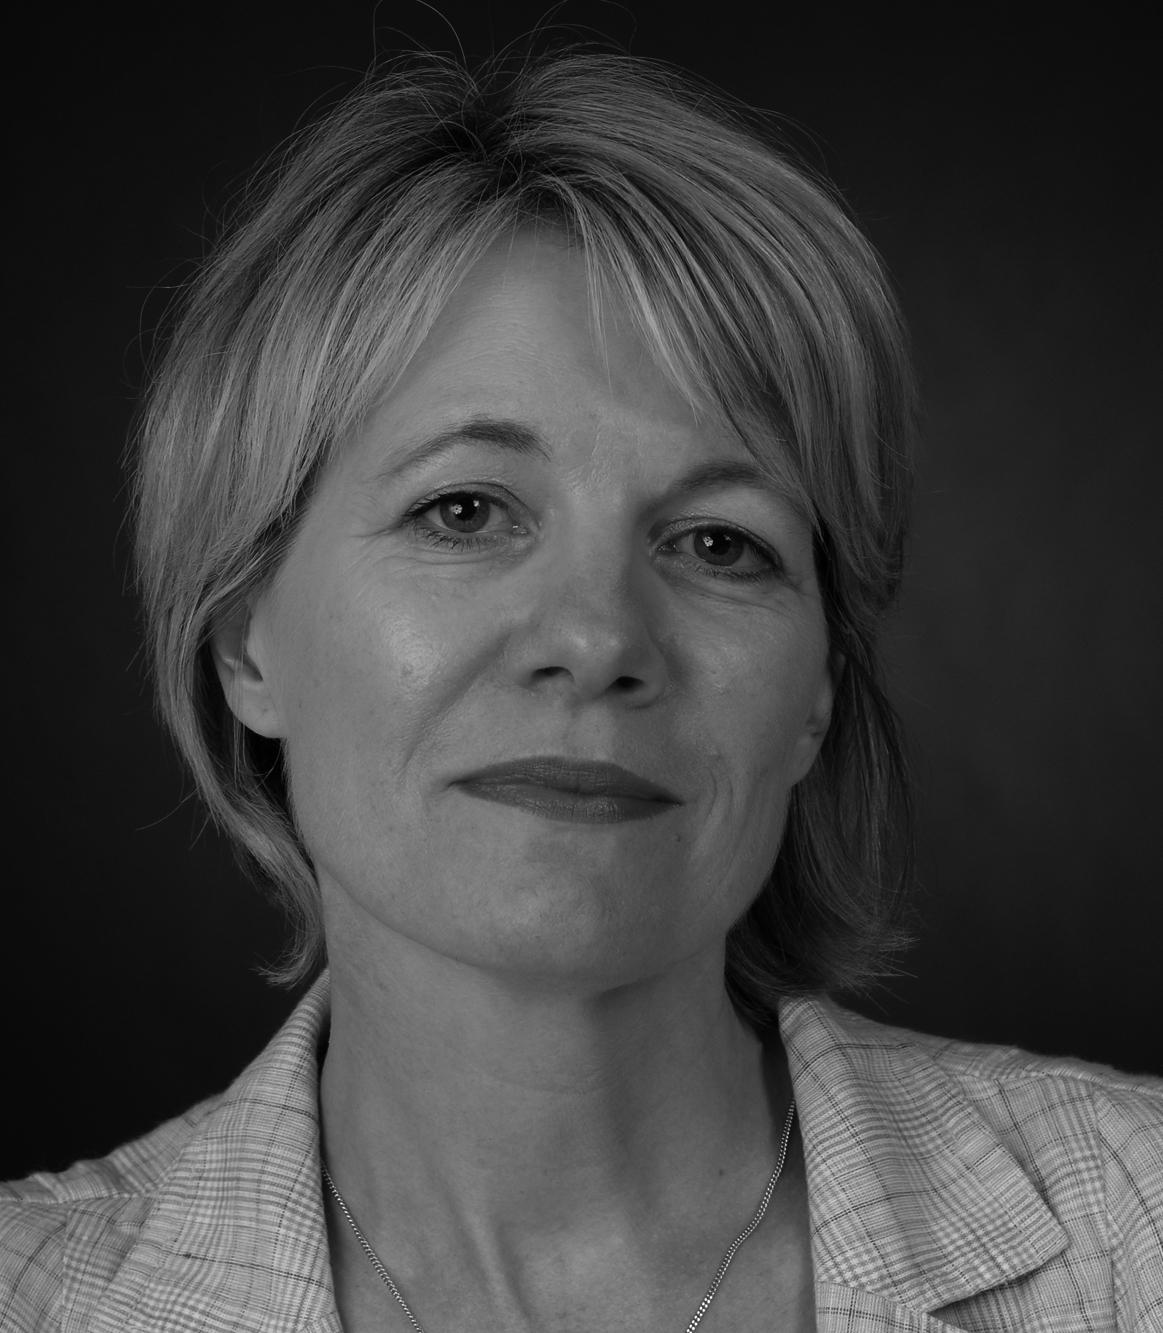 Marie Anne Belembert